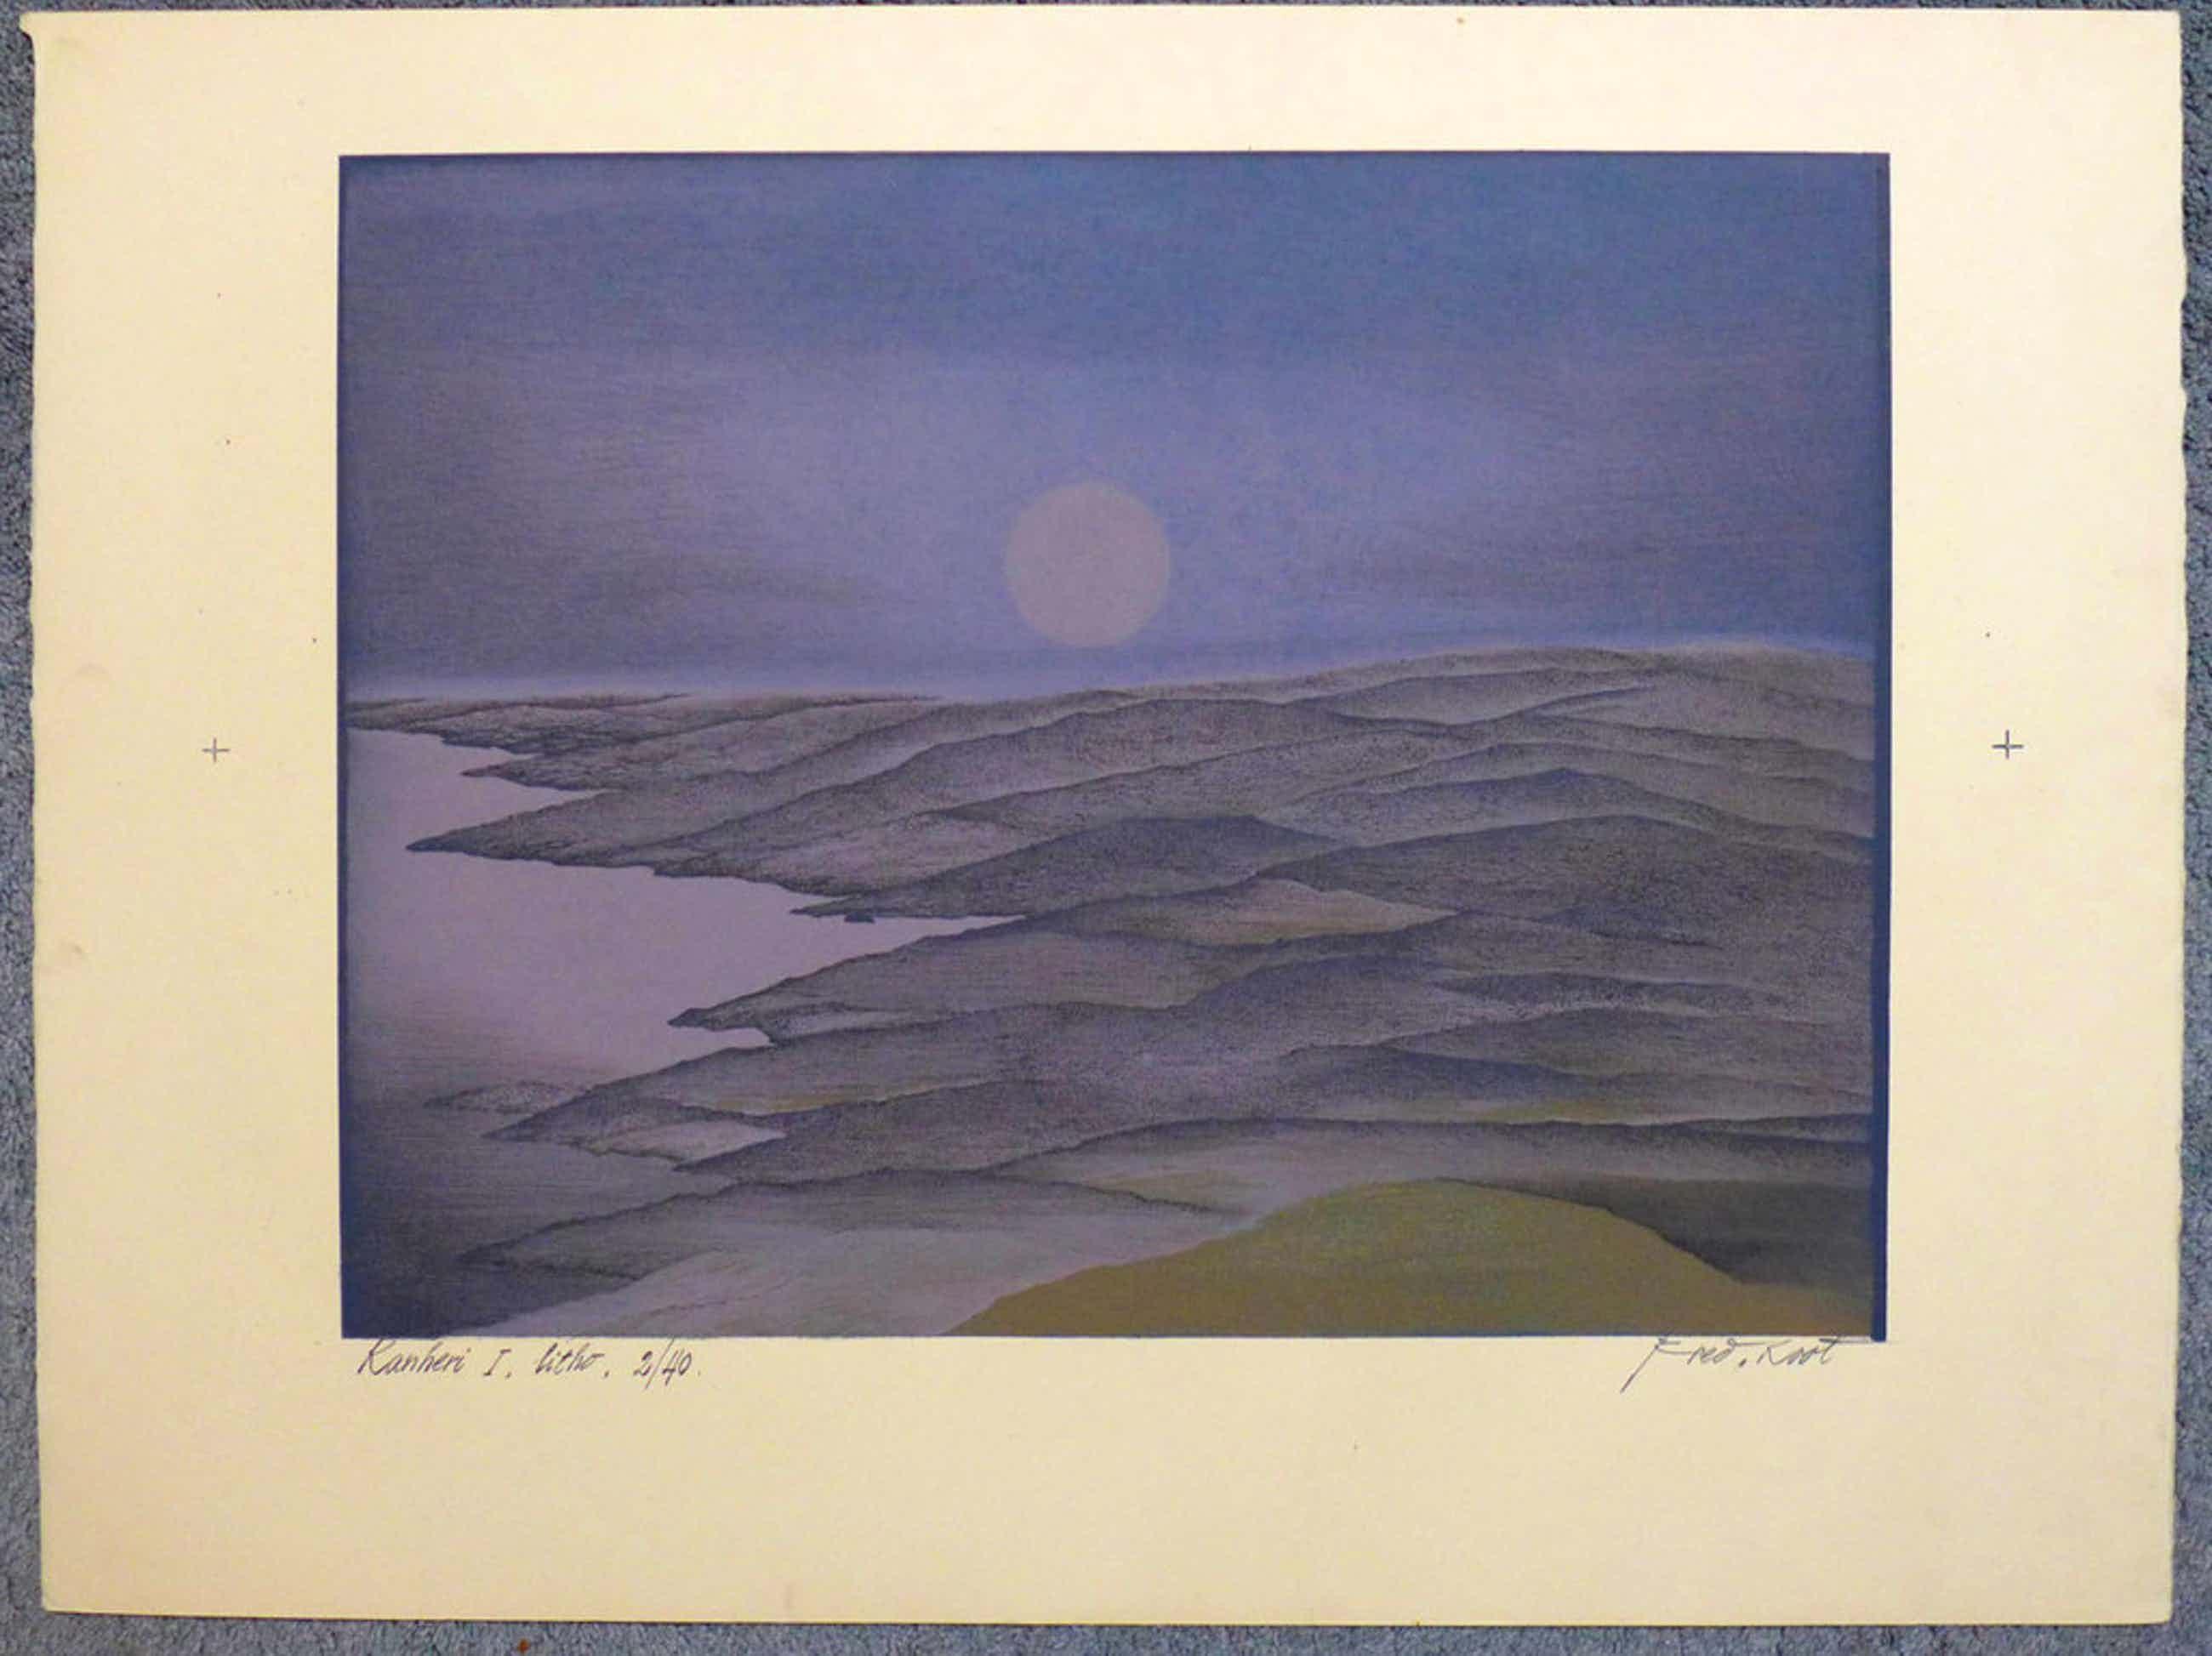 Fred Koot, litho, titel Kanheri I, oplage 2/40, beeldformaat 35,3 x 44,8 cm.  kopen? Bied vanaf 50!